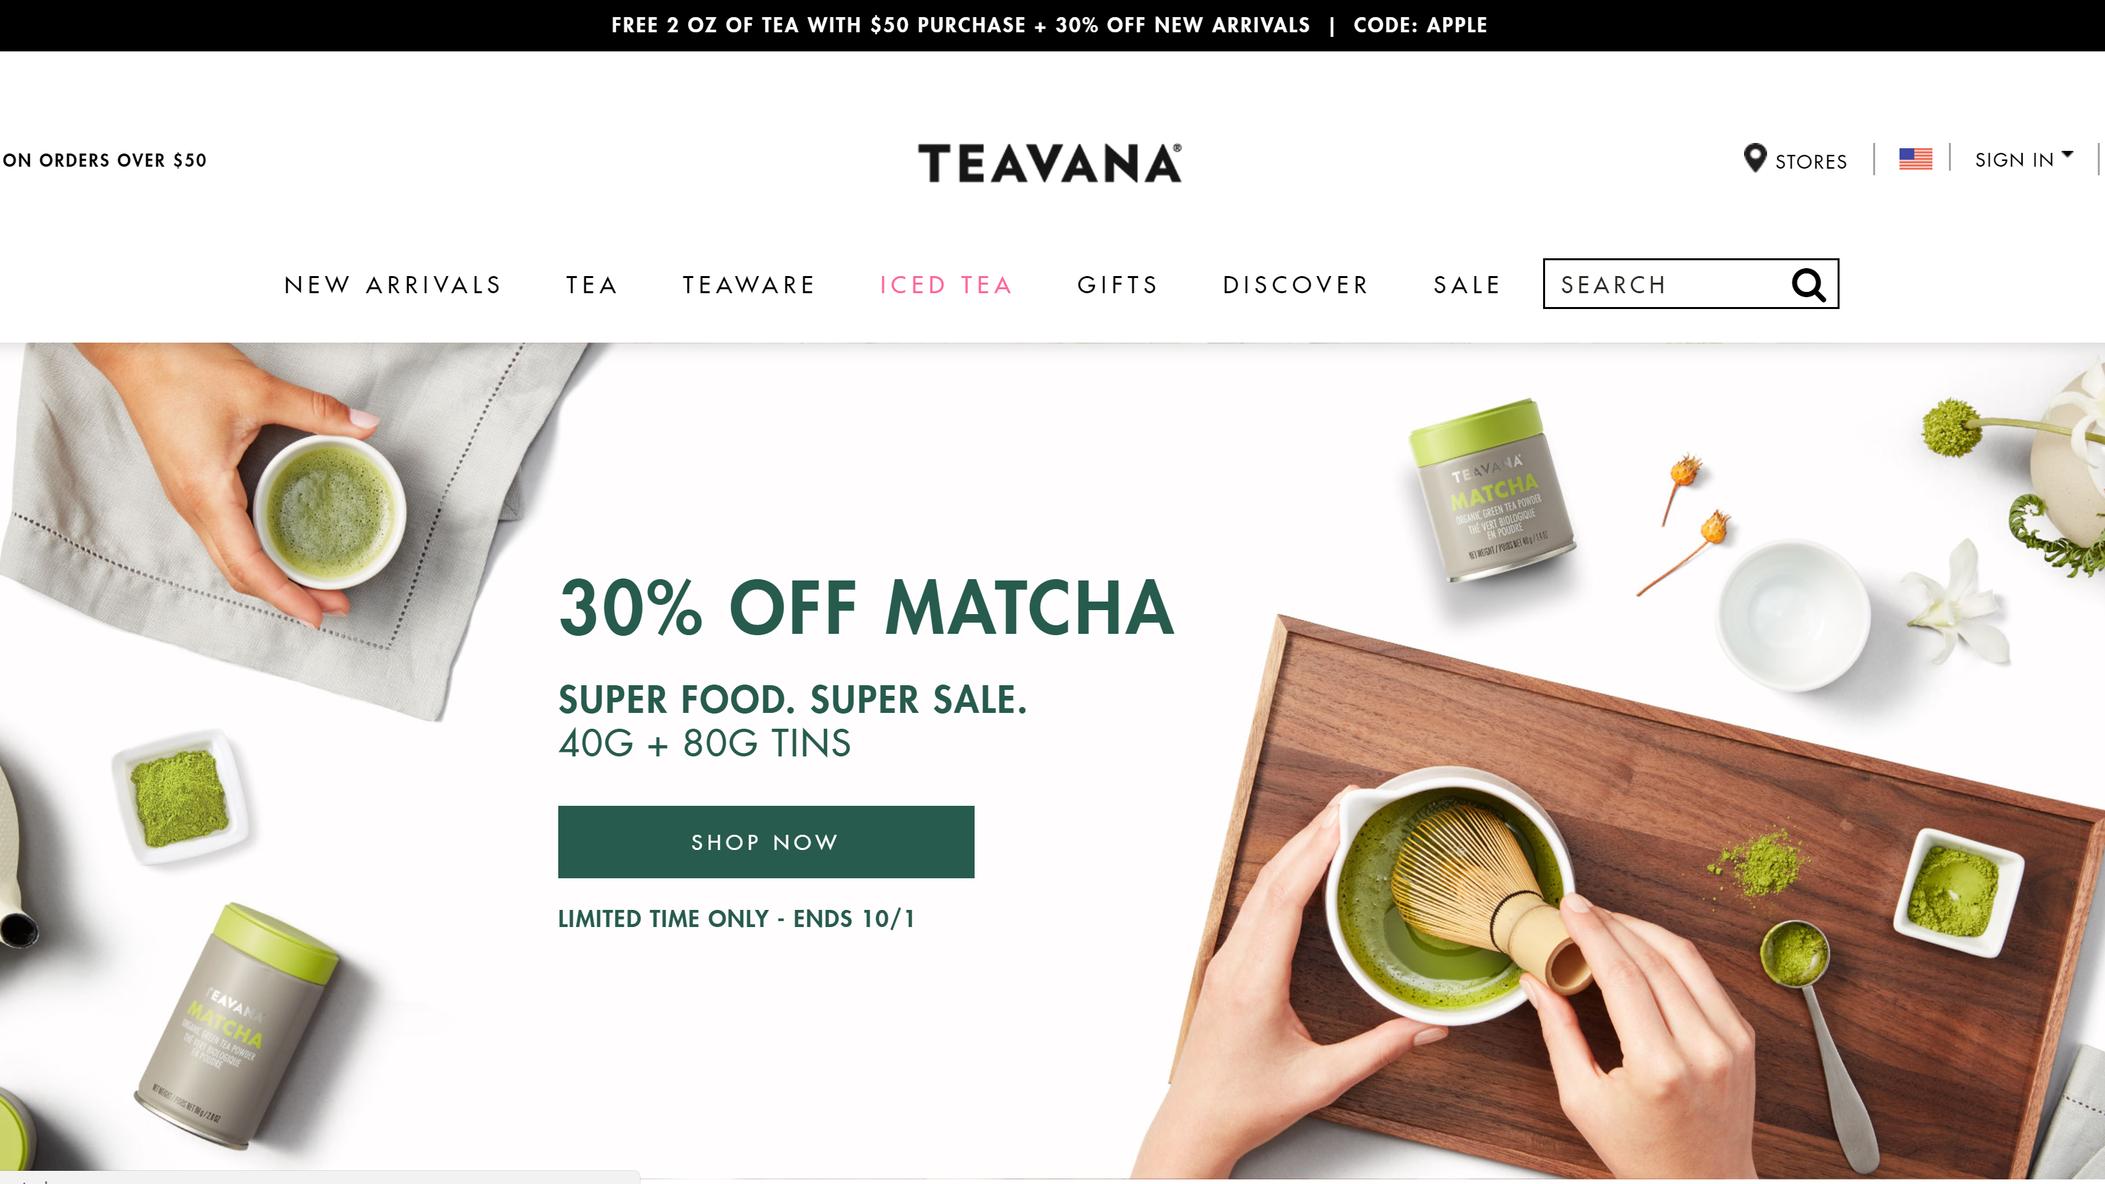 Teavana1.png